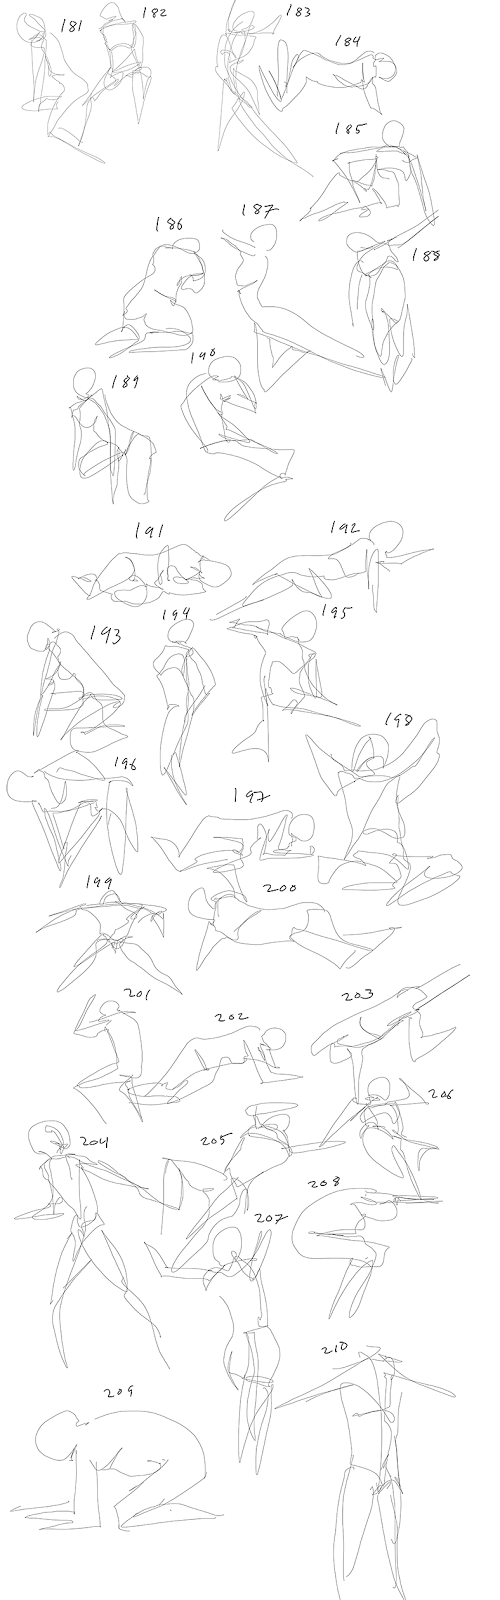 [Image: Gestures_07.png]